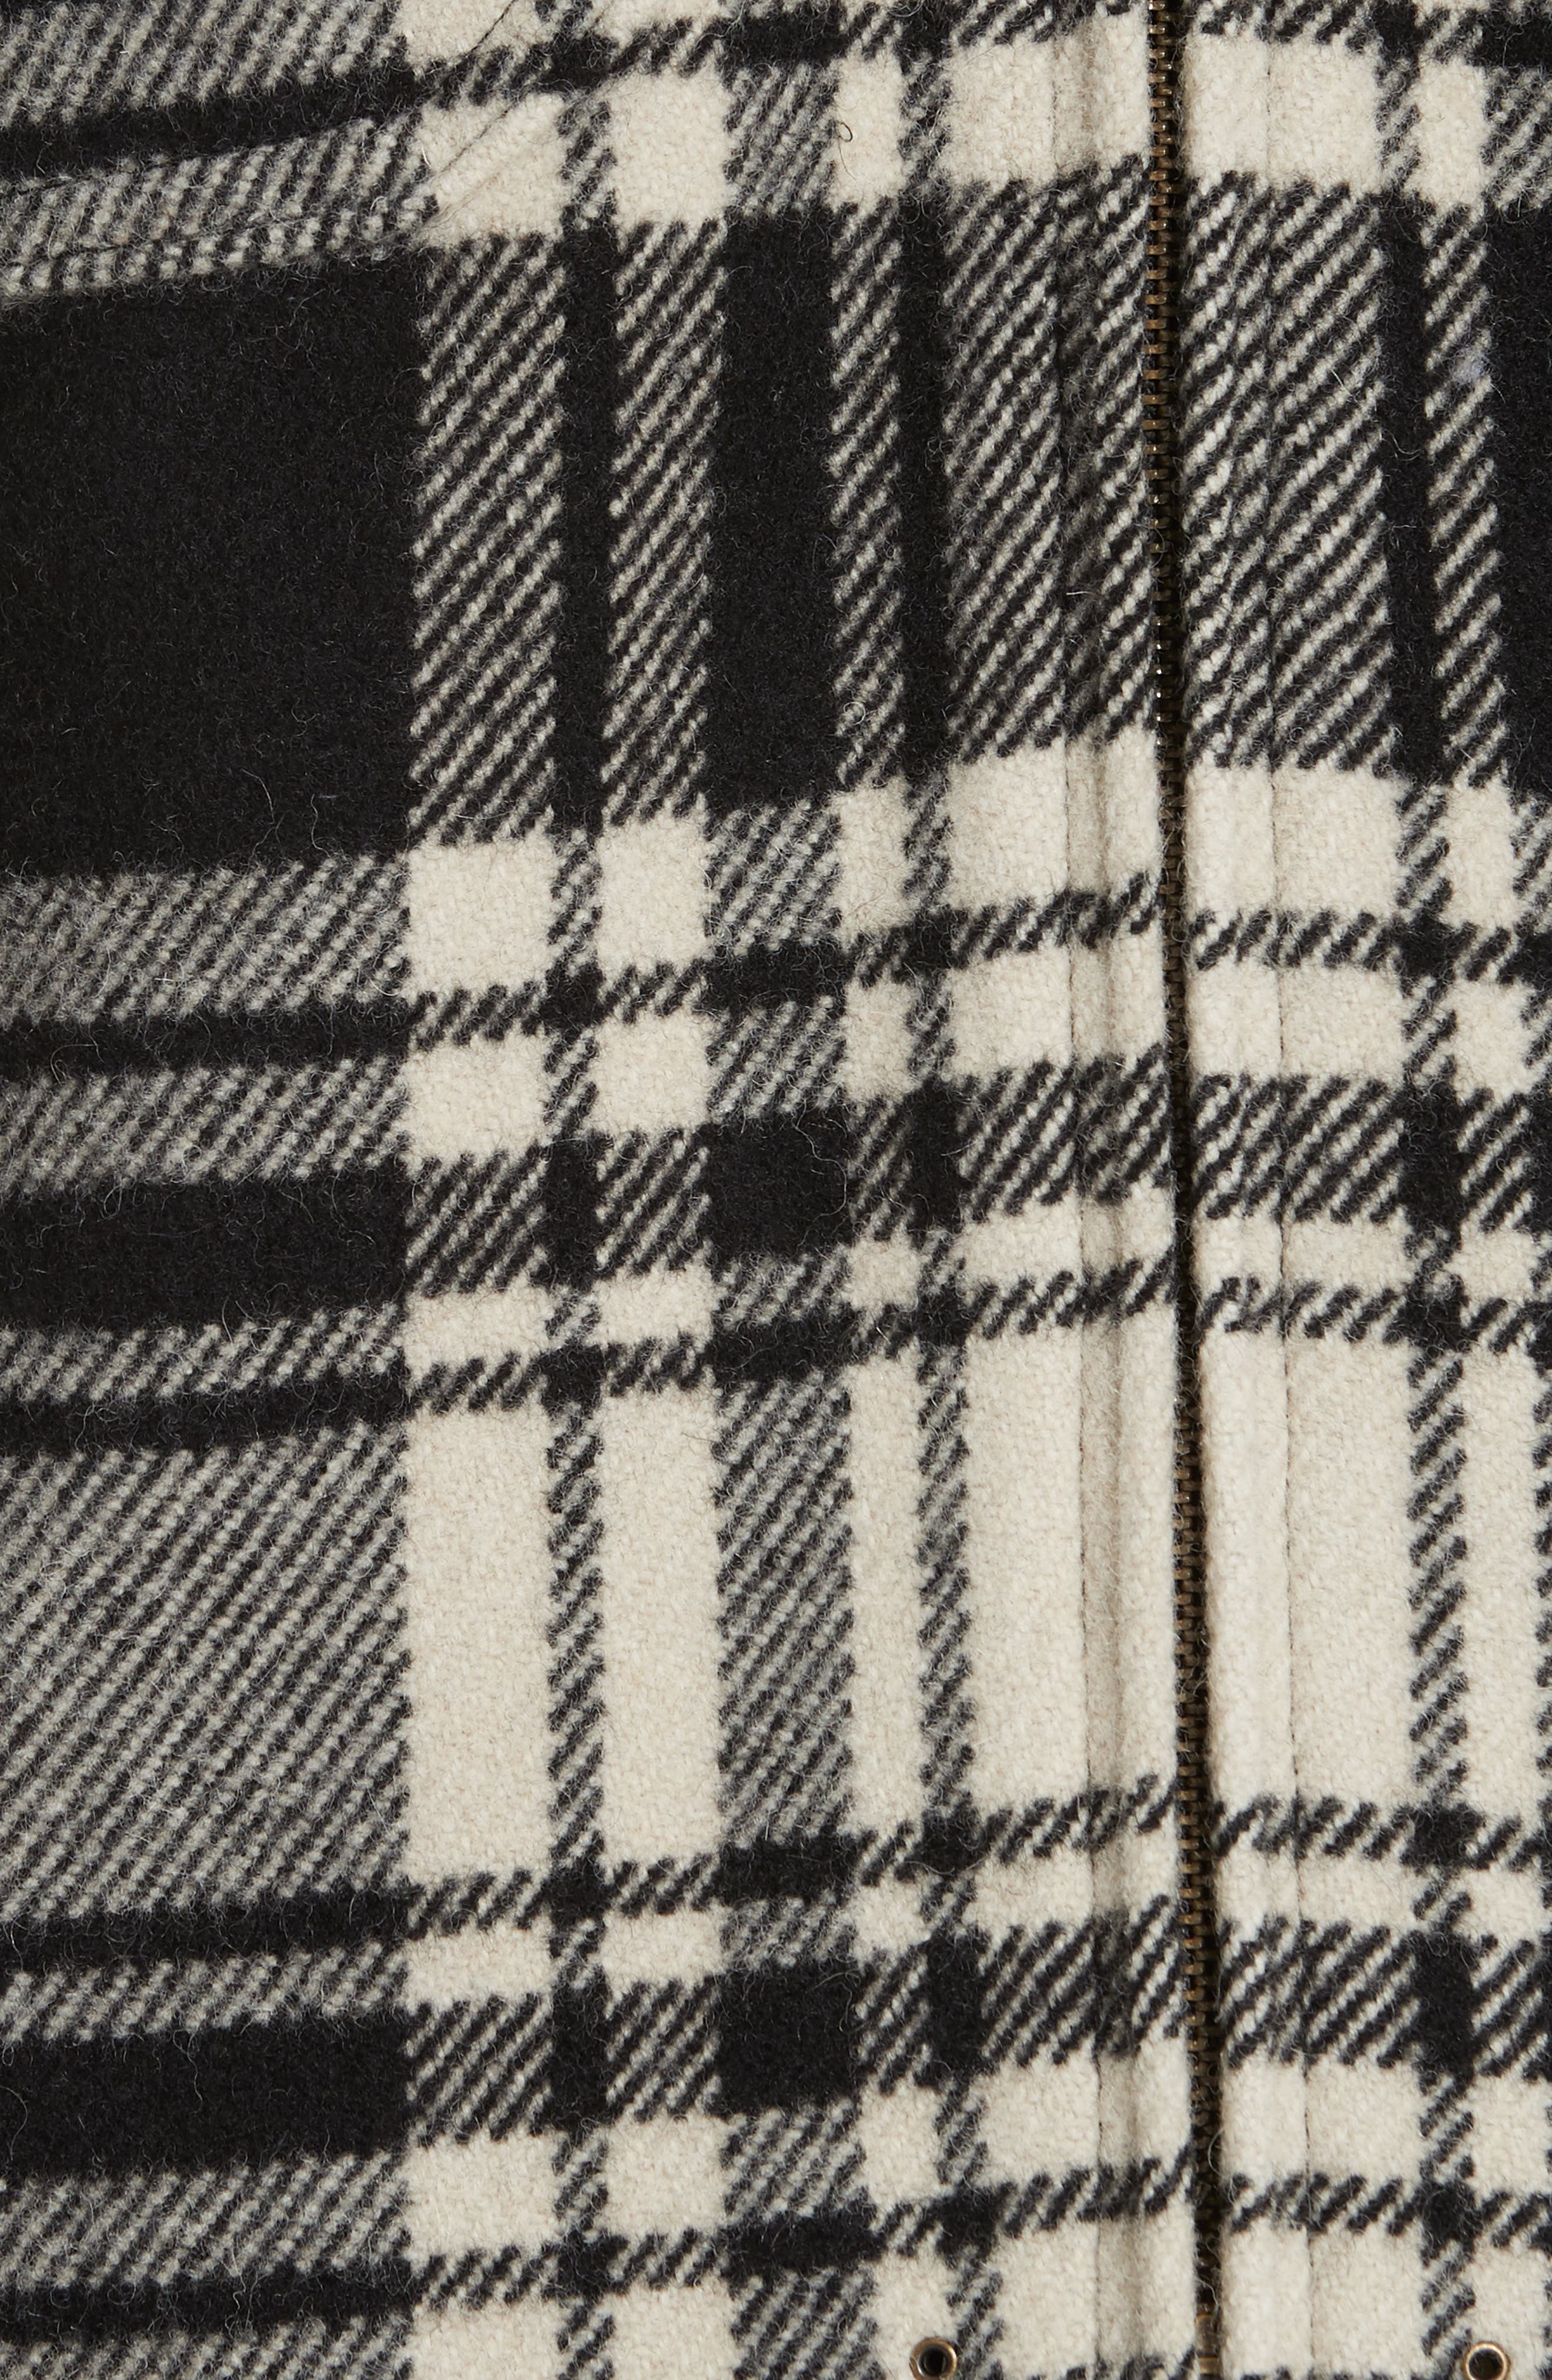 Wool Blend Plaid Jacket,                             Alternate thumbnail 6, color,                             BLACK/ CREAM